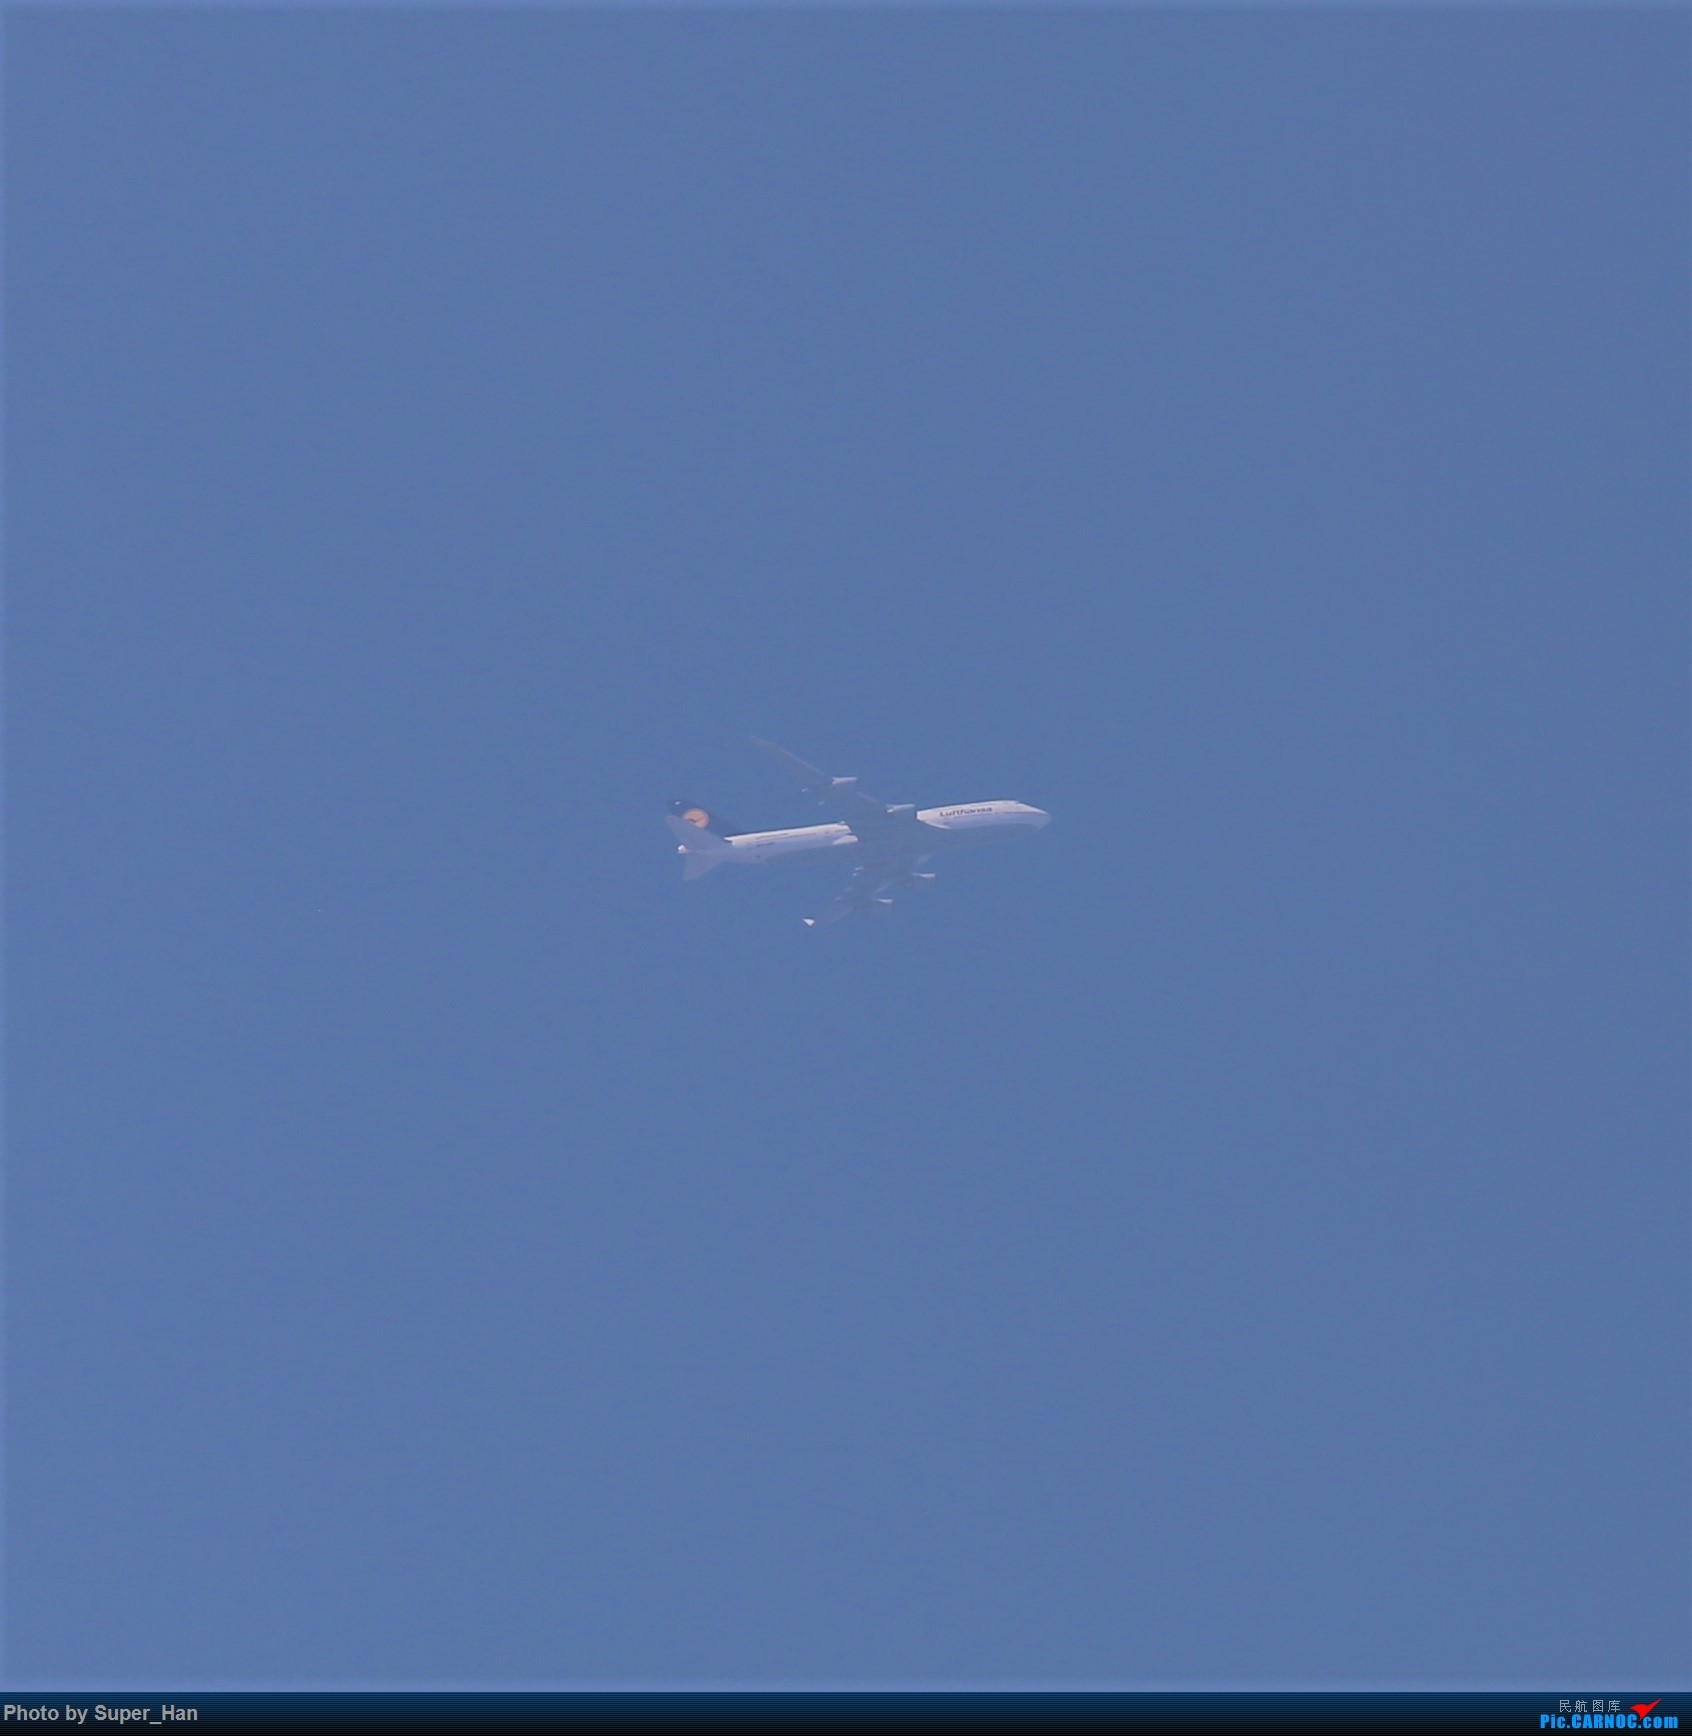 Re:[原创]【杭州飞友会】0715虹桥头顶降PVG的重型机 BOEING 747-400 DA-BVP 中国上海虹桥国际机场